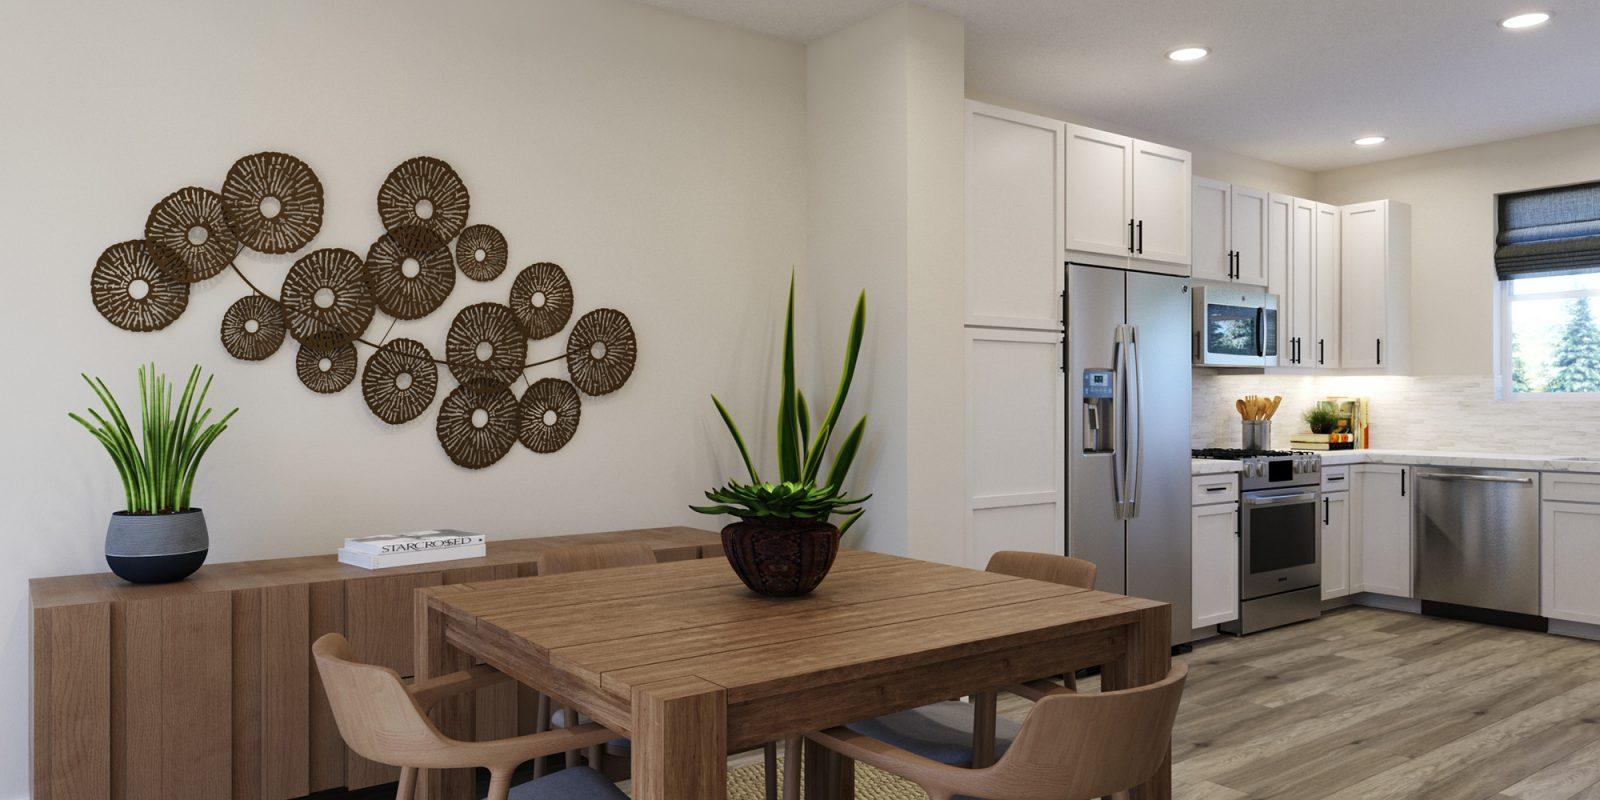 Baseline DoMore Rows: Escape - Dining Nook